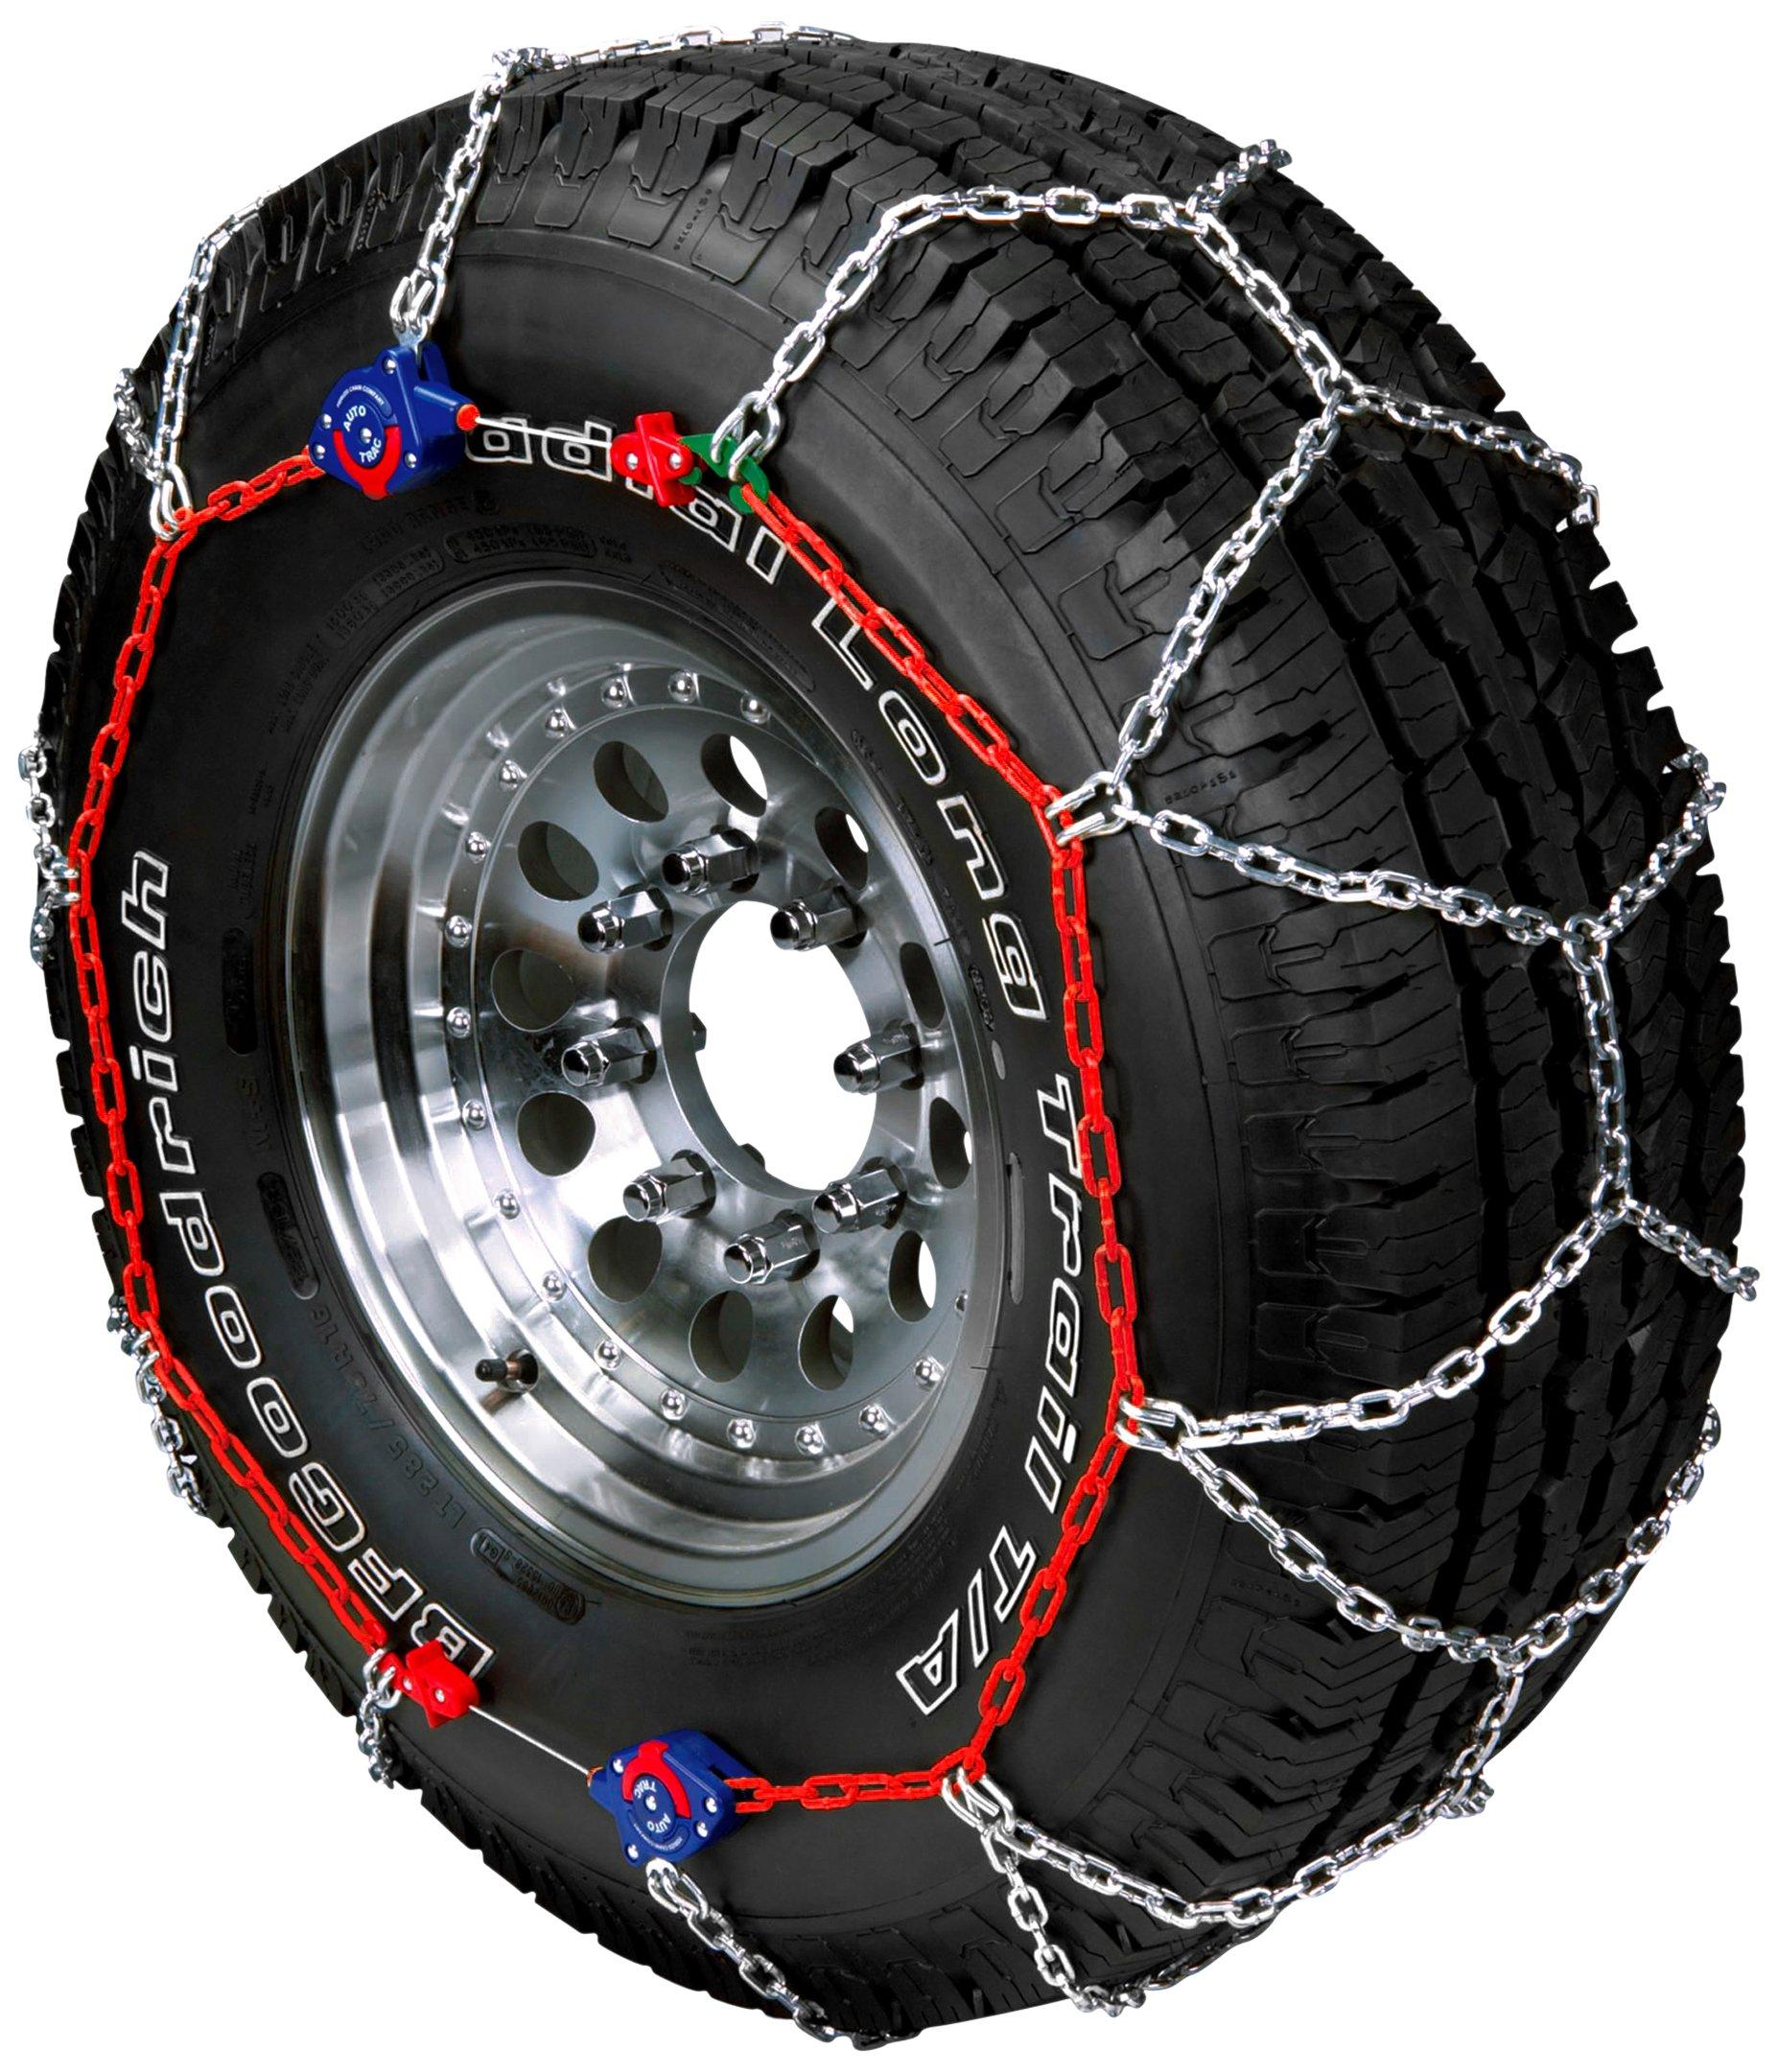 Peerless 0231705 Auto-Trac Light Truck/SUV Tire Traction Chain - Set of 2